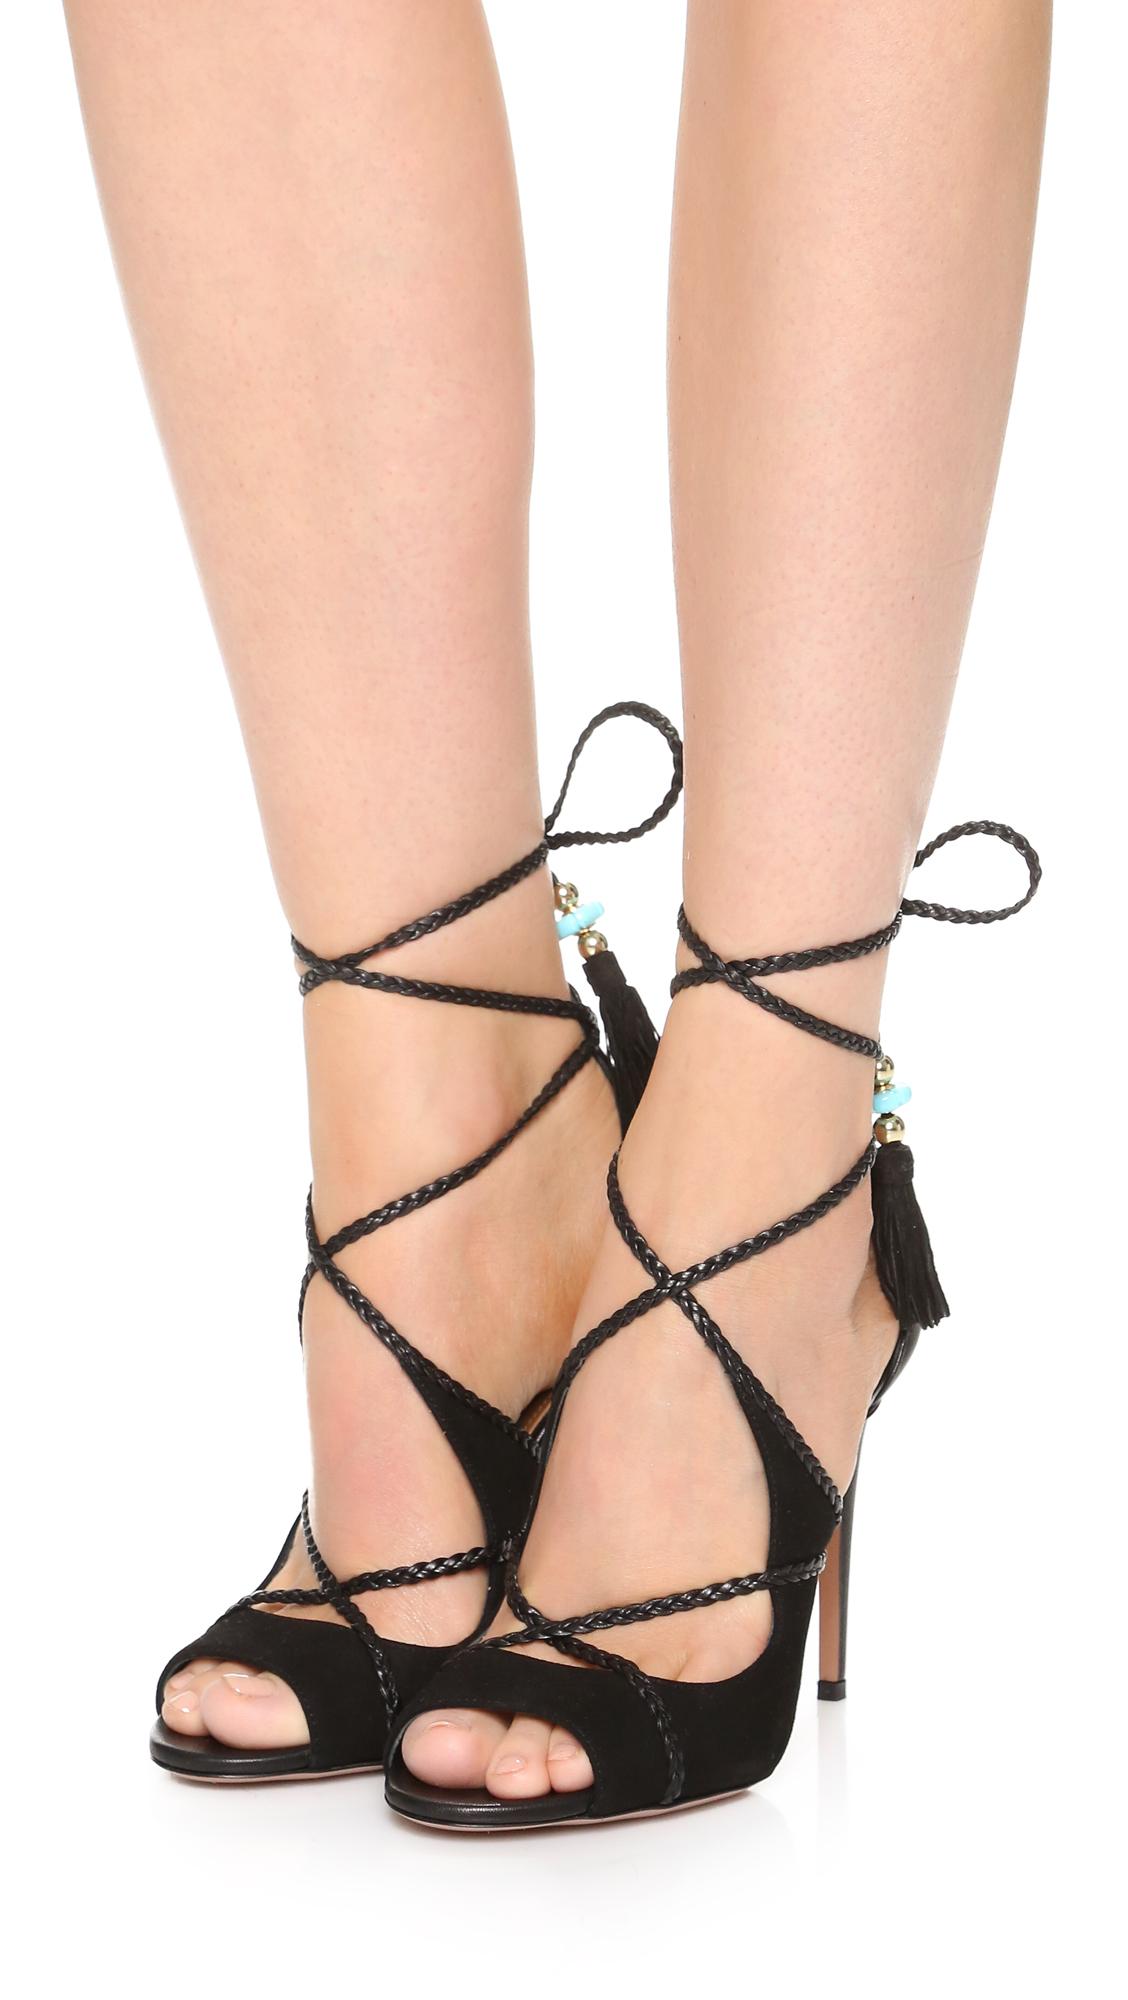 Black poppy sandals - Aquazzura Aquazzura X Poppy Delevingne Hero Sandals 15 Off First App Purchase With Code 15foryou